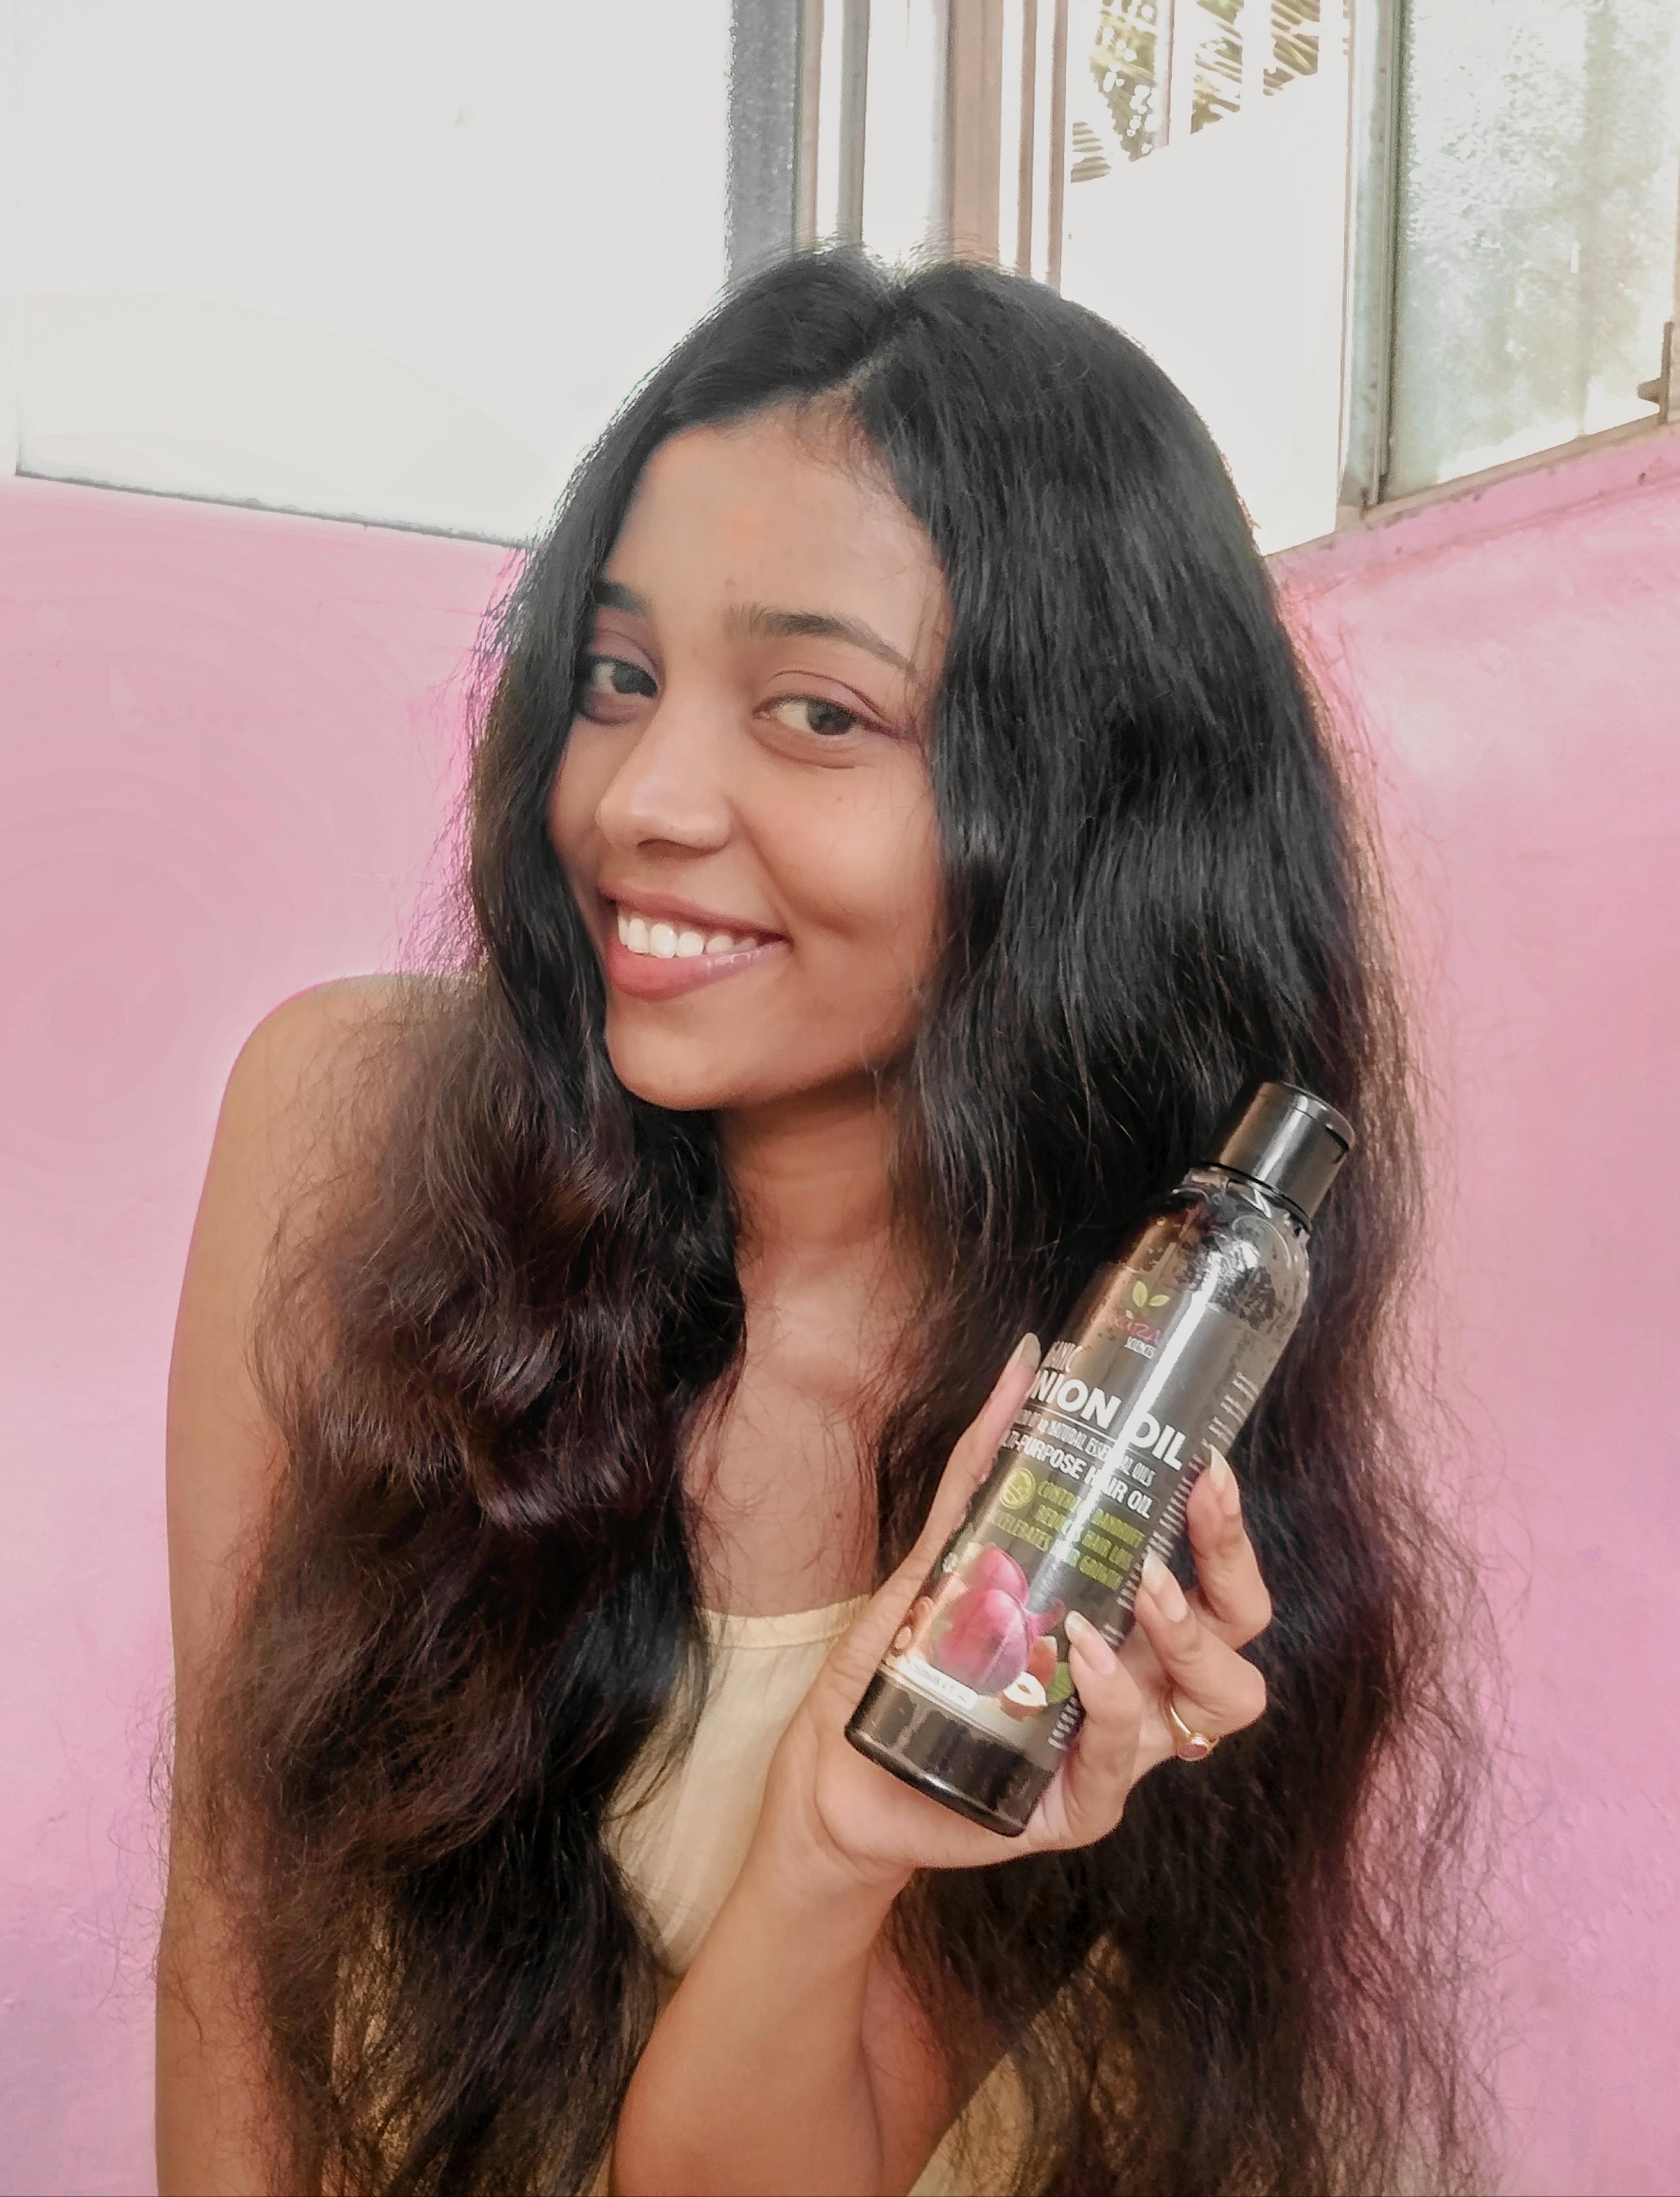 Luxura Sciences Onion Hair Oil 250 ml-Goodness of Onion-By soumita_samanta_-1